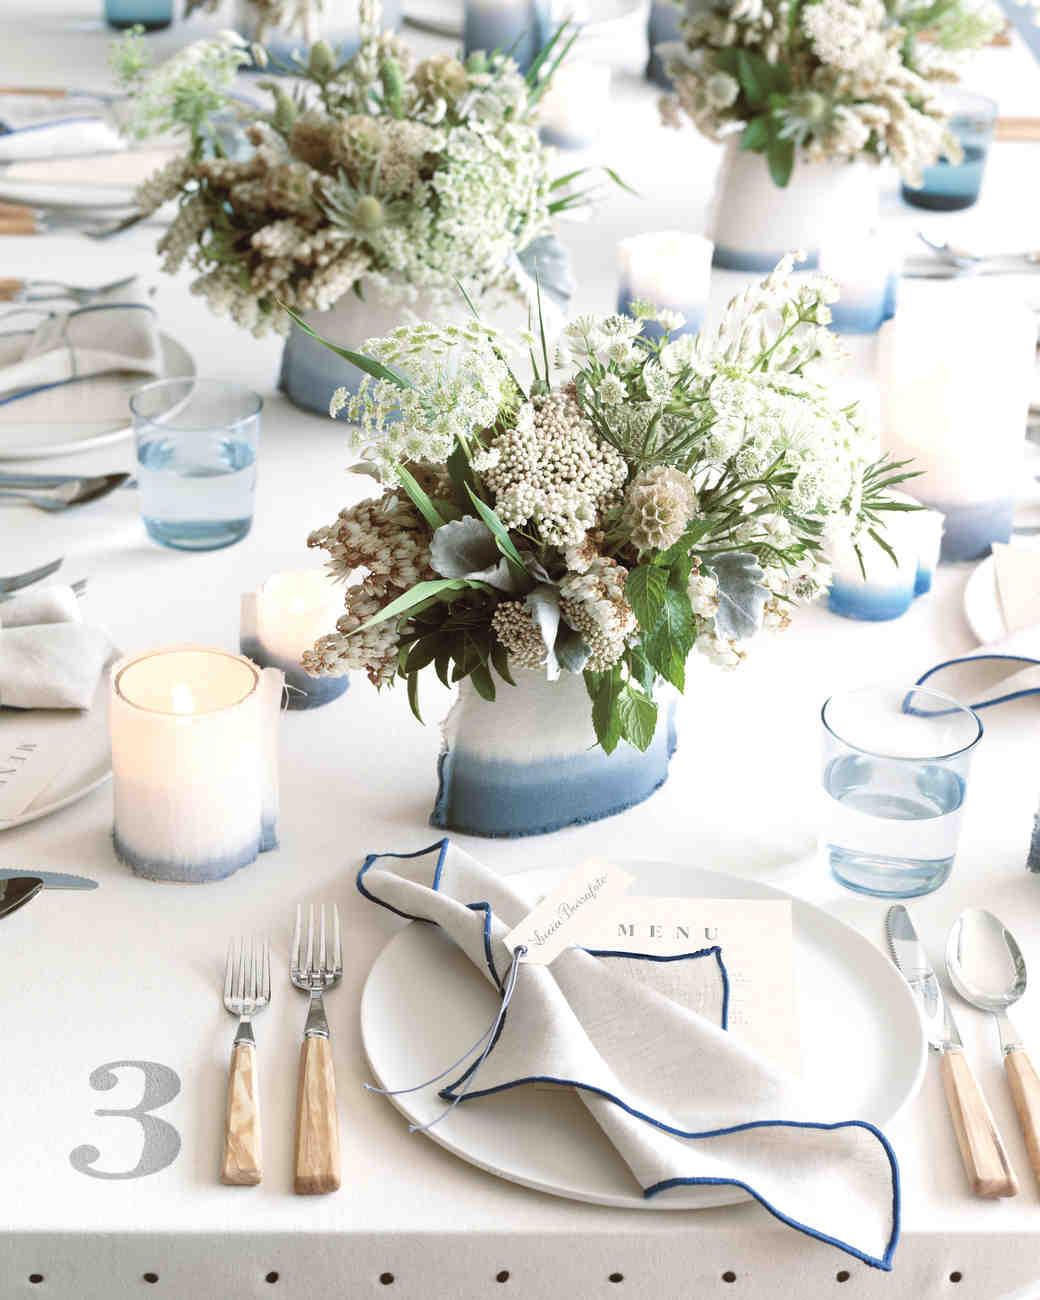 table-setting-0131-d111114.jpg